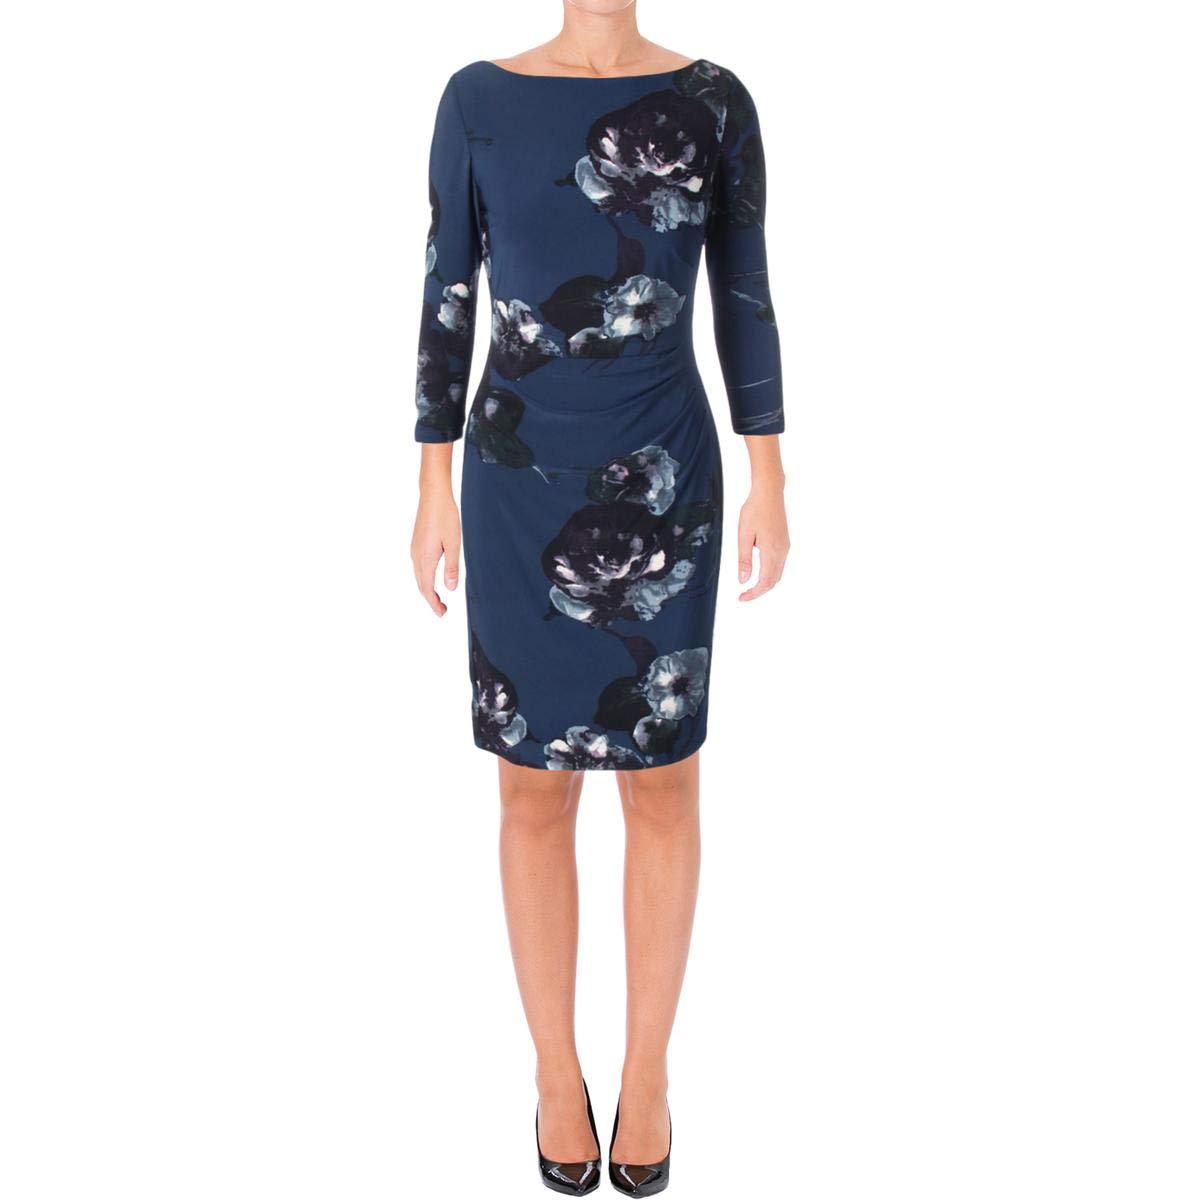 Lauren Ralph Lauren Womens Ruched Side Floral Print Wear to Work Dress bluee 4